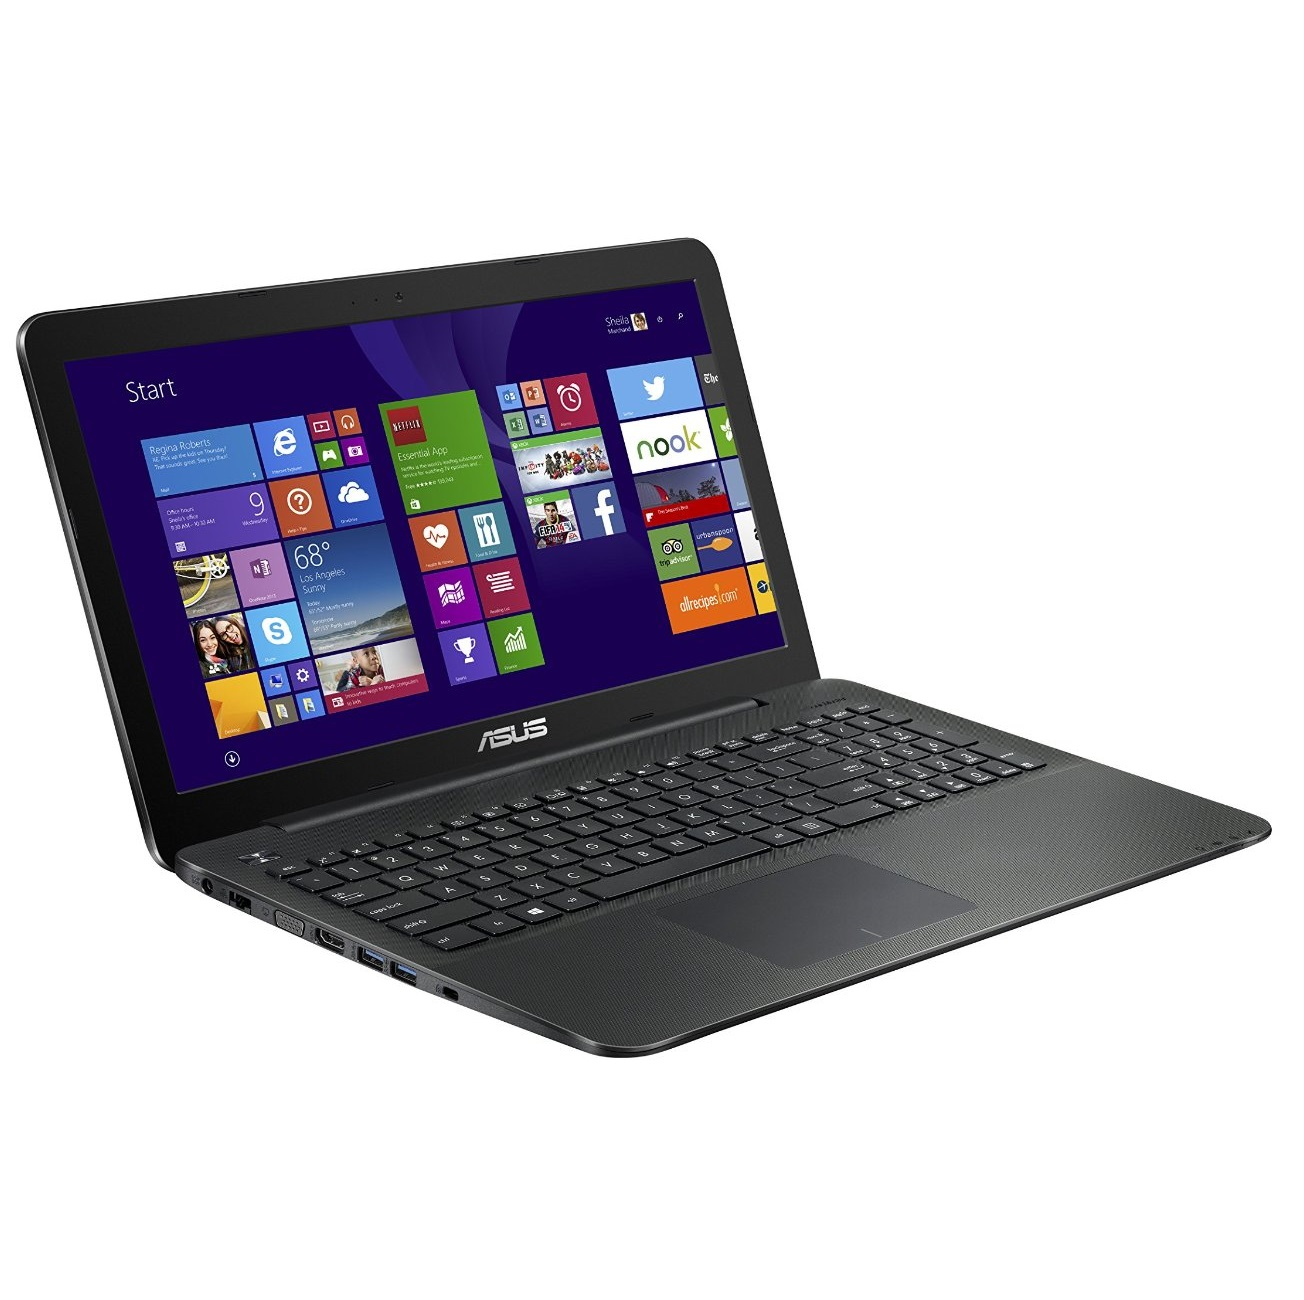 Laptop Asus X554LA-XX1233D core i3 5010U 2GB/500GB/15.6